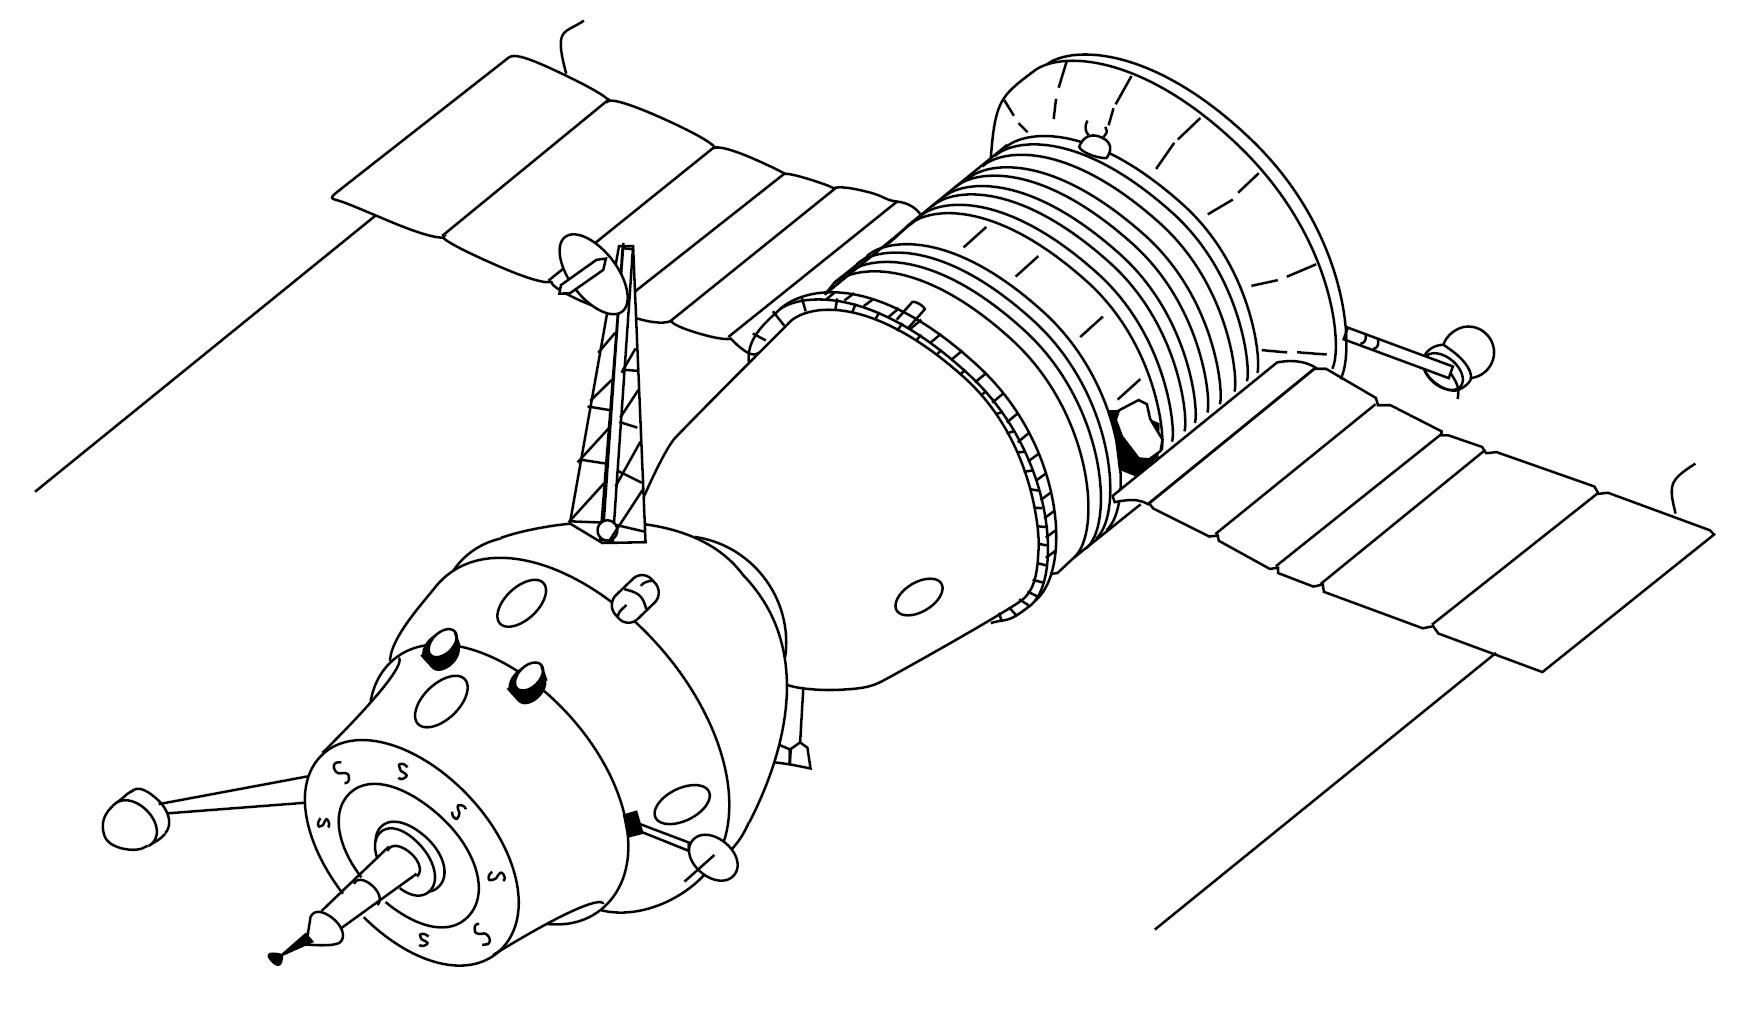 Soyuz_7K-OK%28A%29_drawing.png